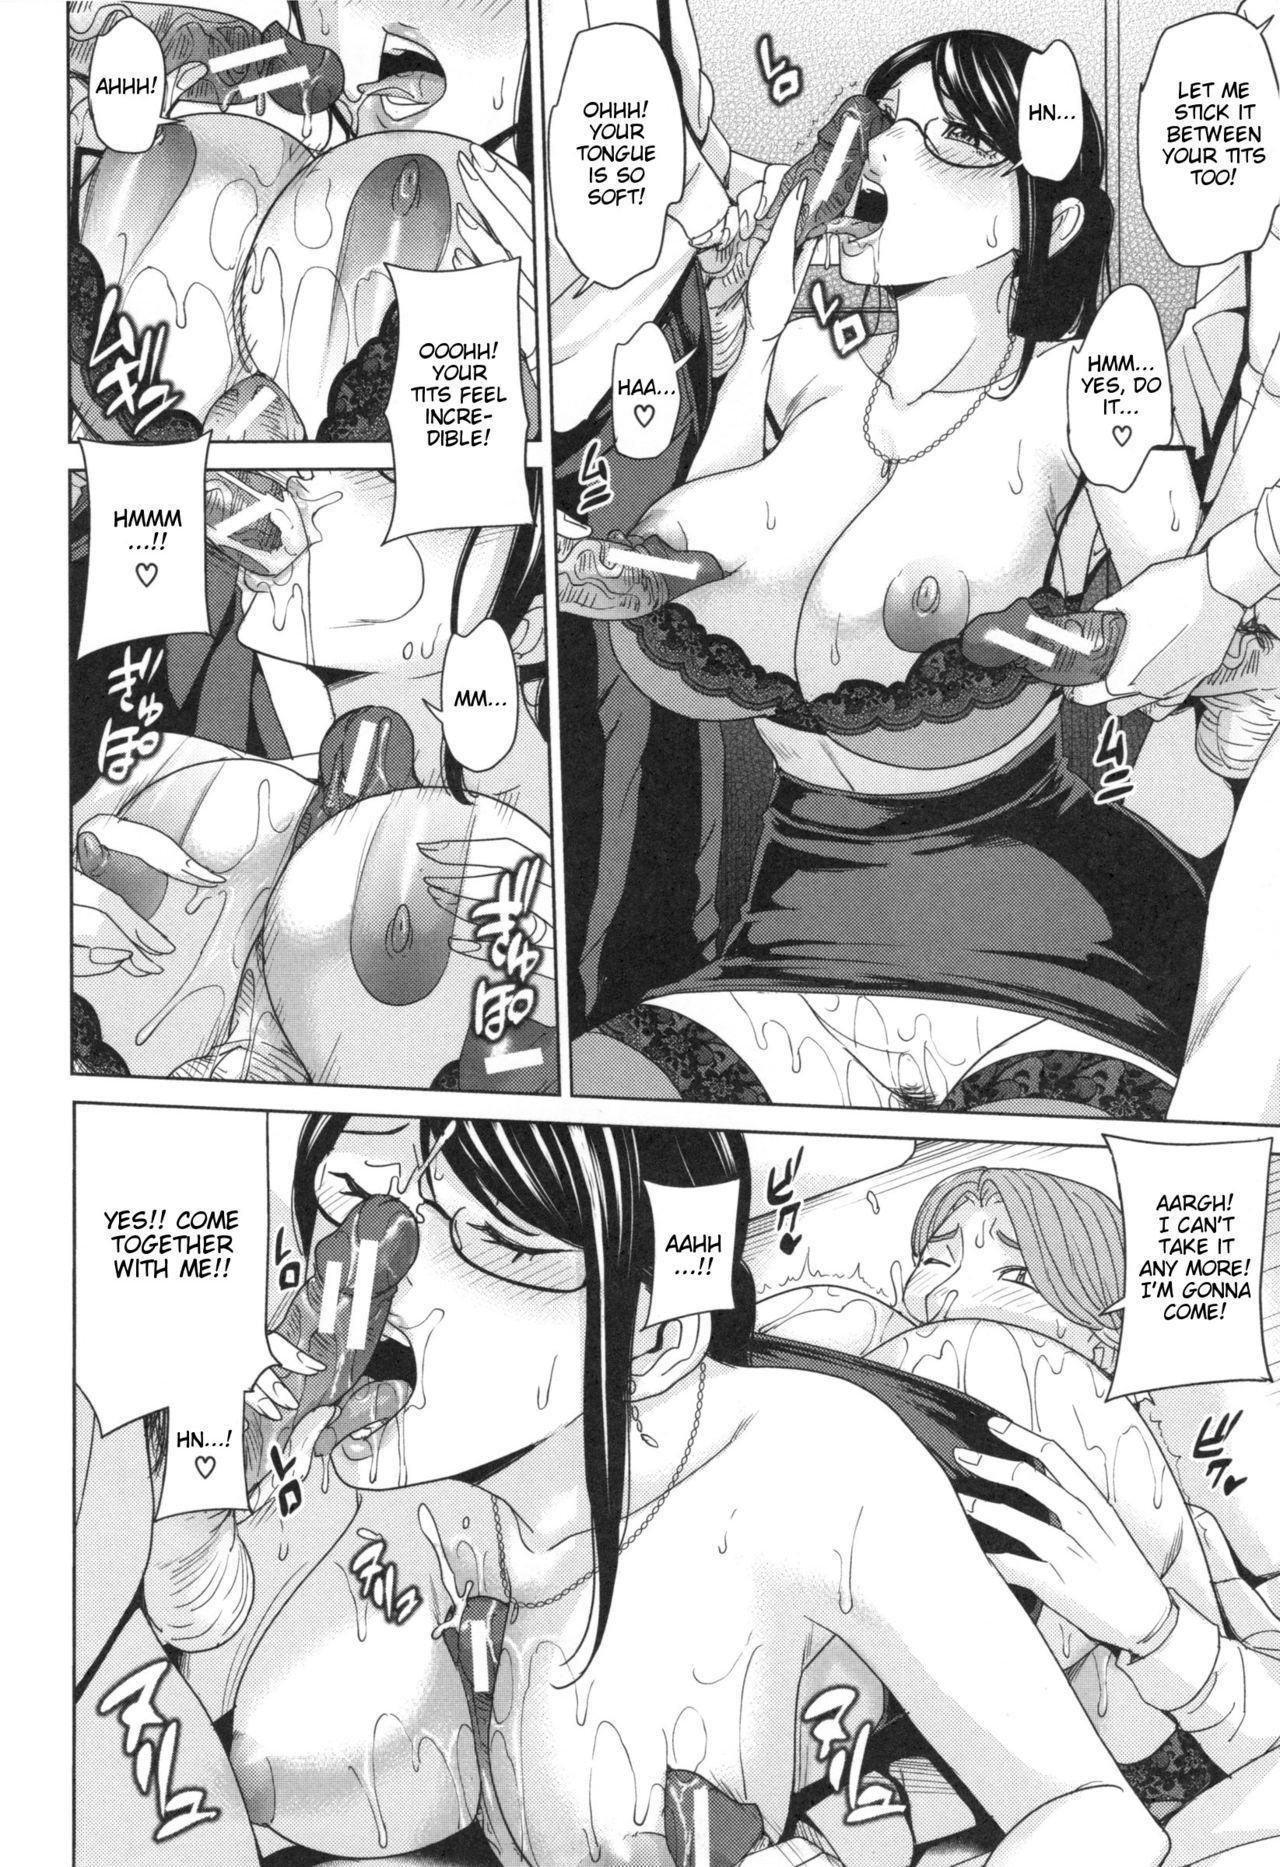 [Maimu-Maimu] Aniyome Bitch Life | Sister-in-Law Slut Life [English] {Taihen Zombii} 134